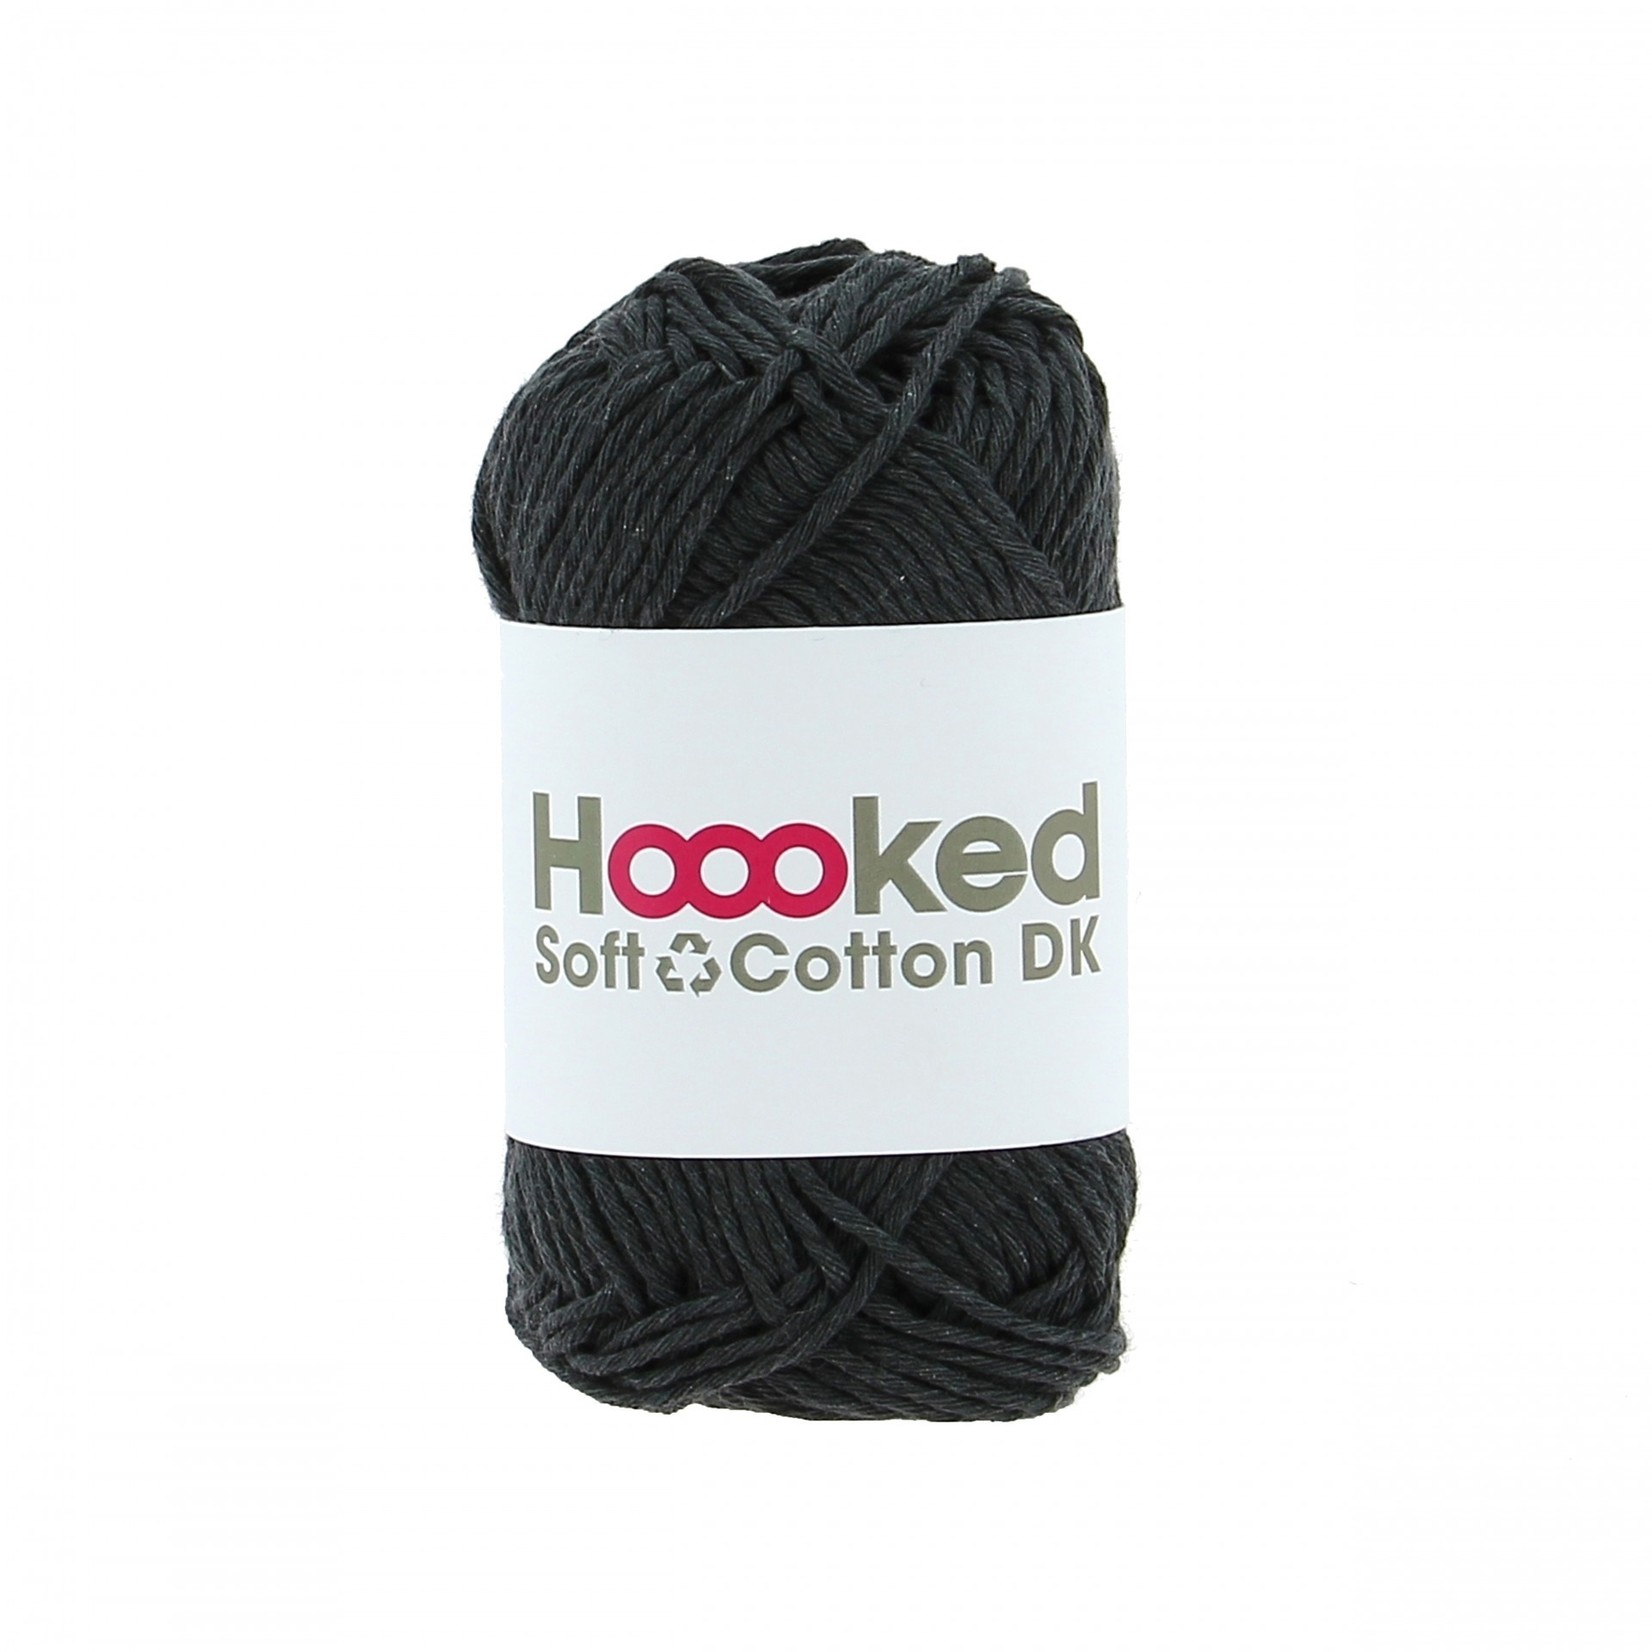 Hoooked Hoooked Soft Cotton DK London Charcoal bundel 5 x 50 gr. / 85 m.